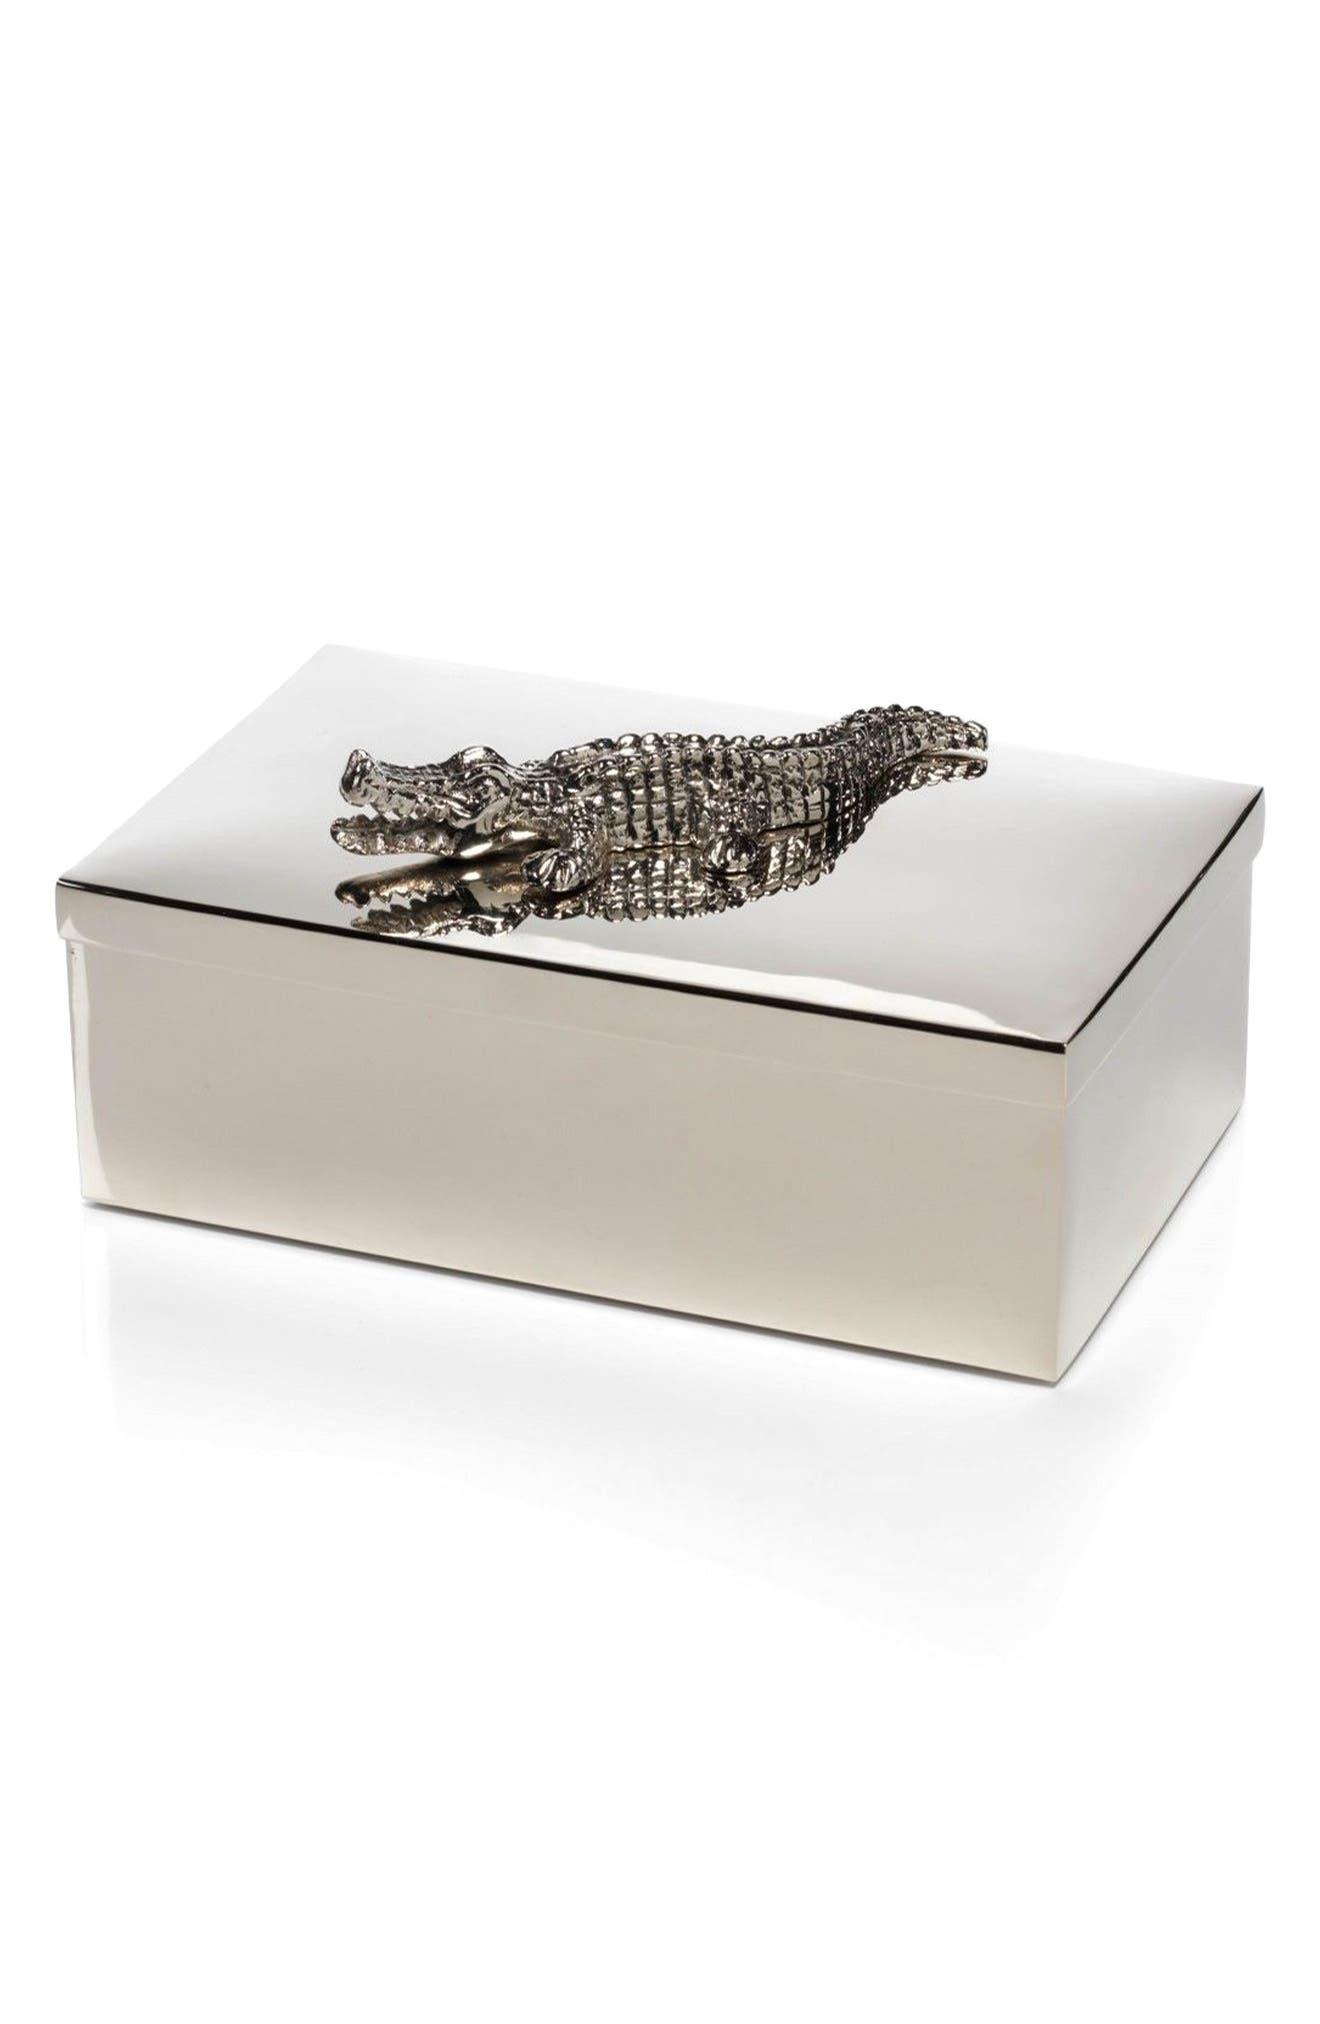 Main Image - Zodax Crocodile Mirrored Jewelry Box